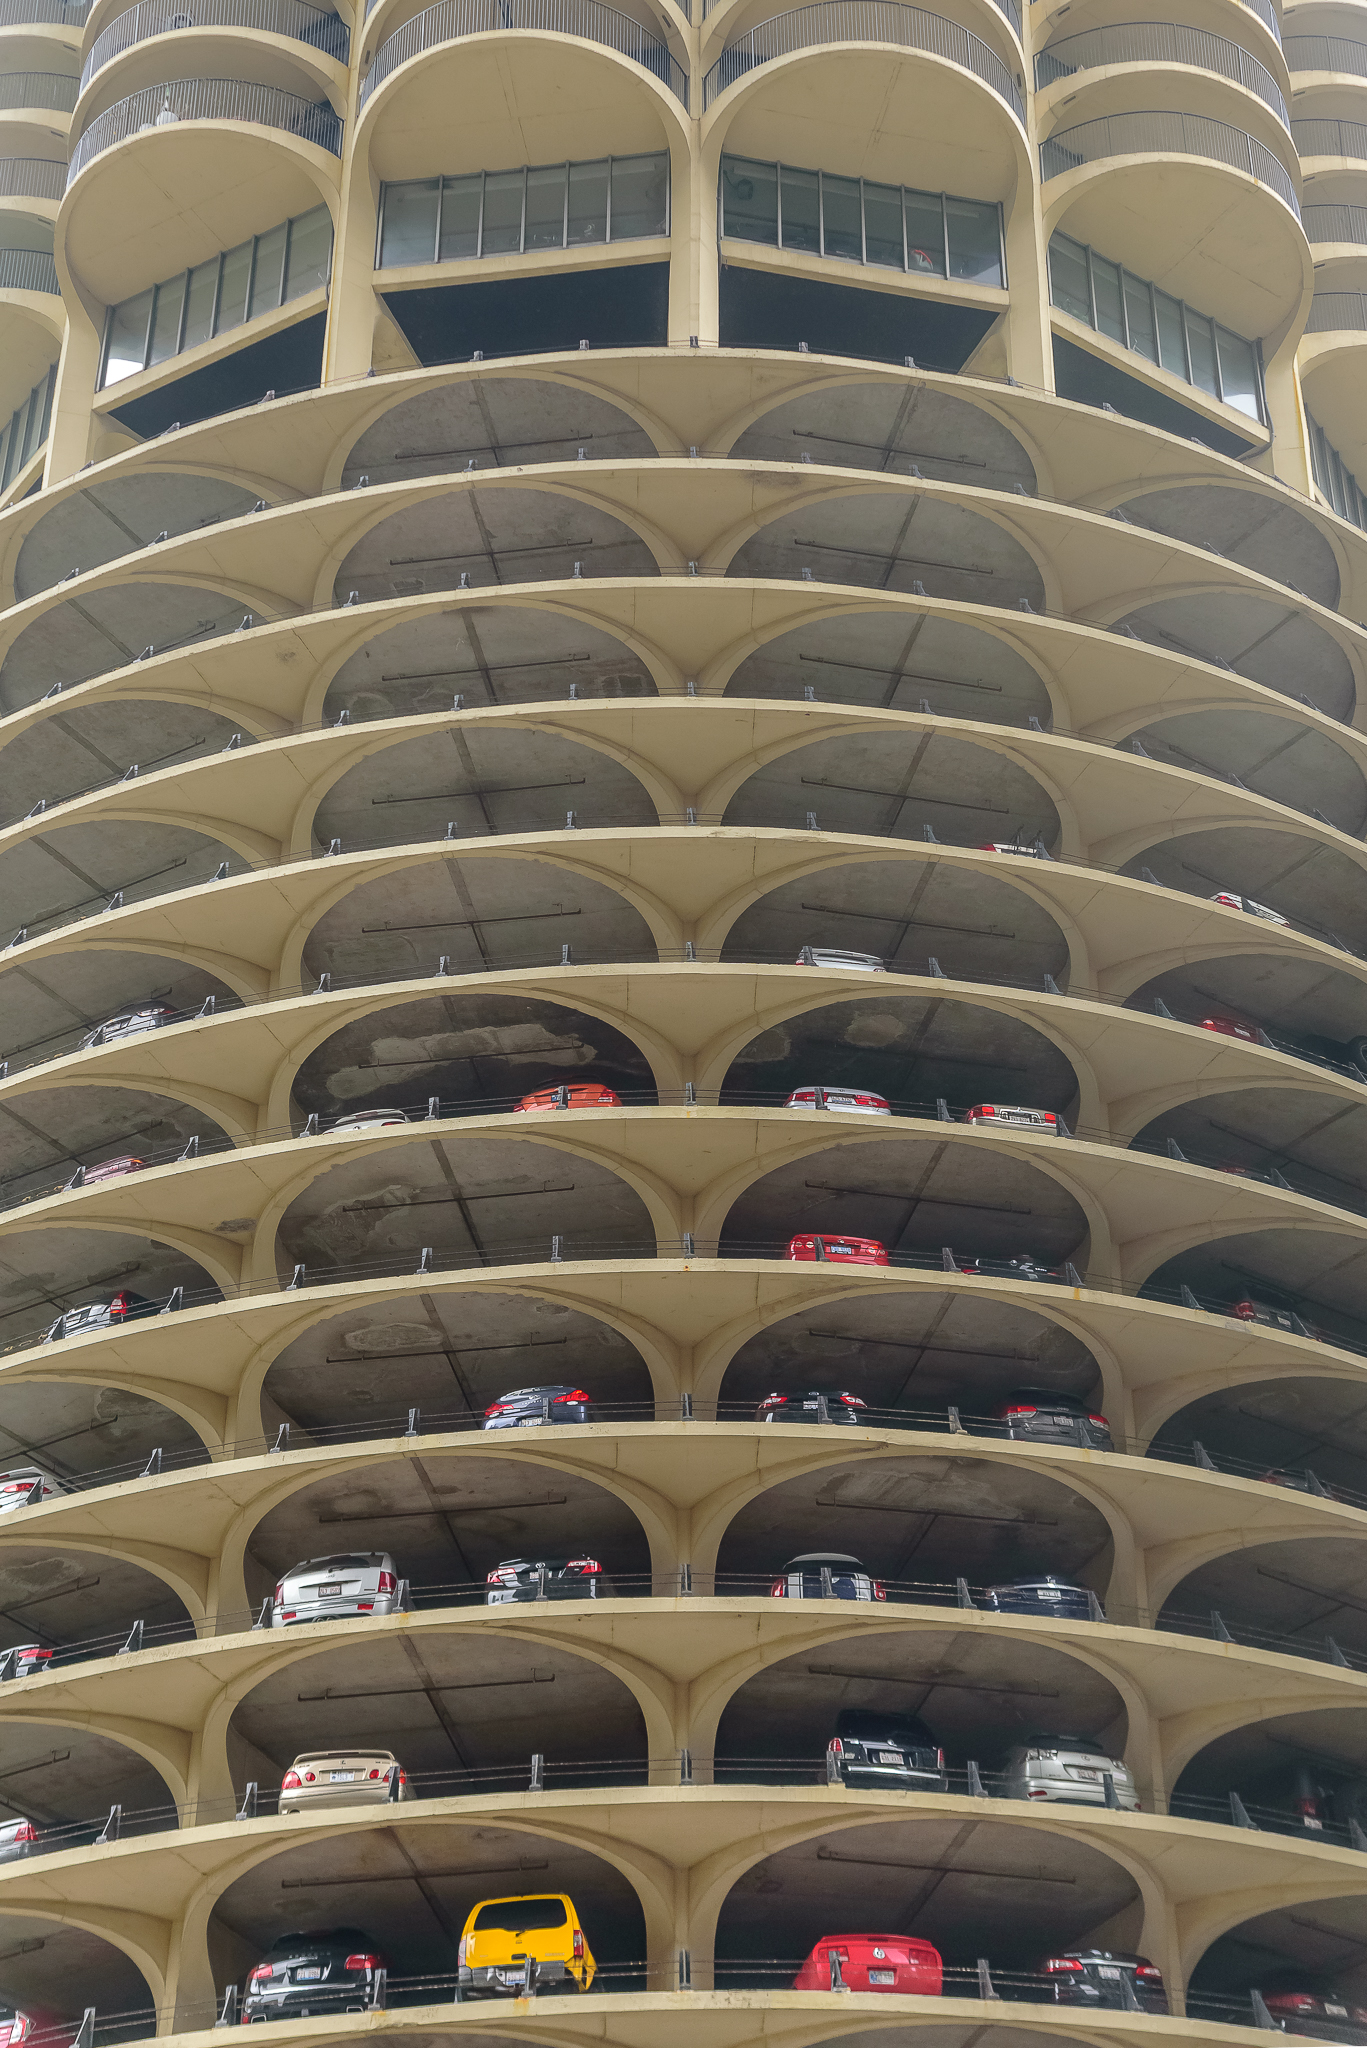 Tourist-ing, hard. Downtown, Chicago.